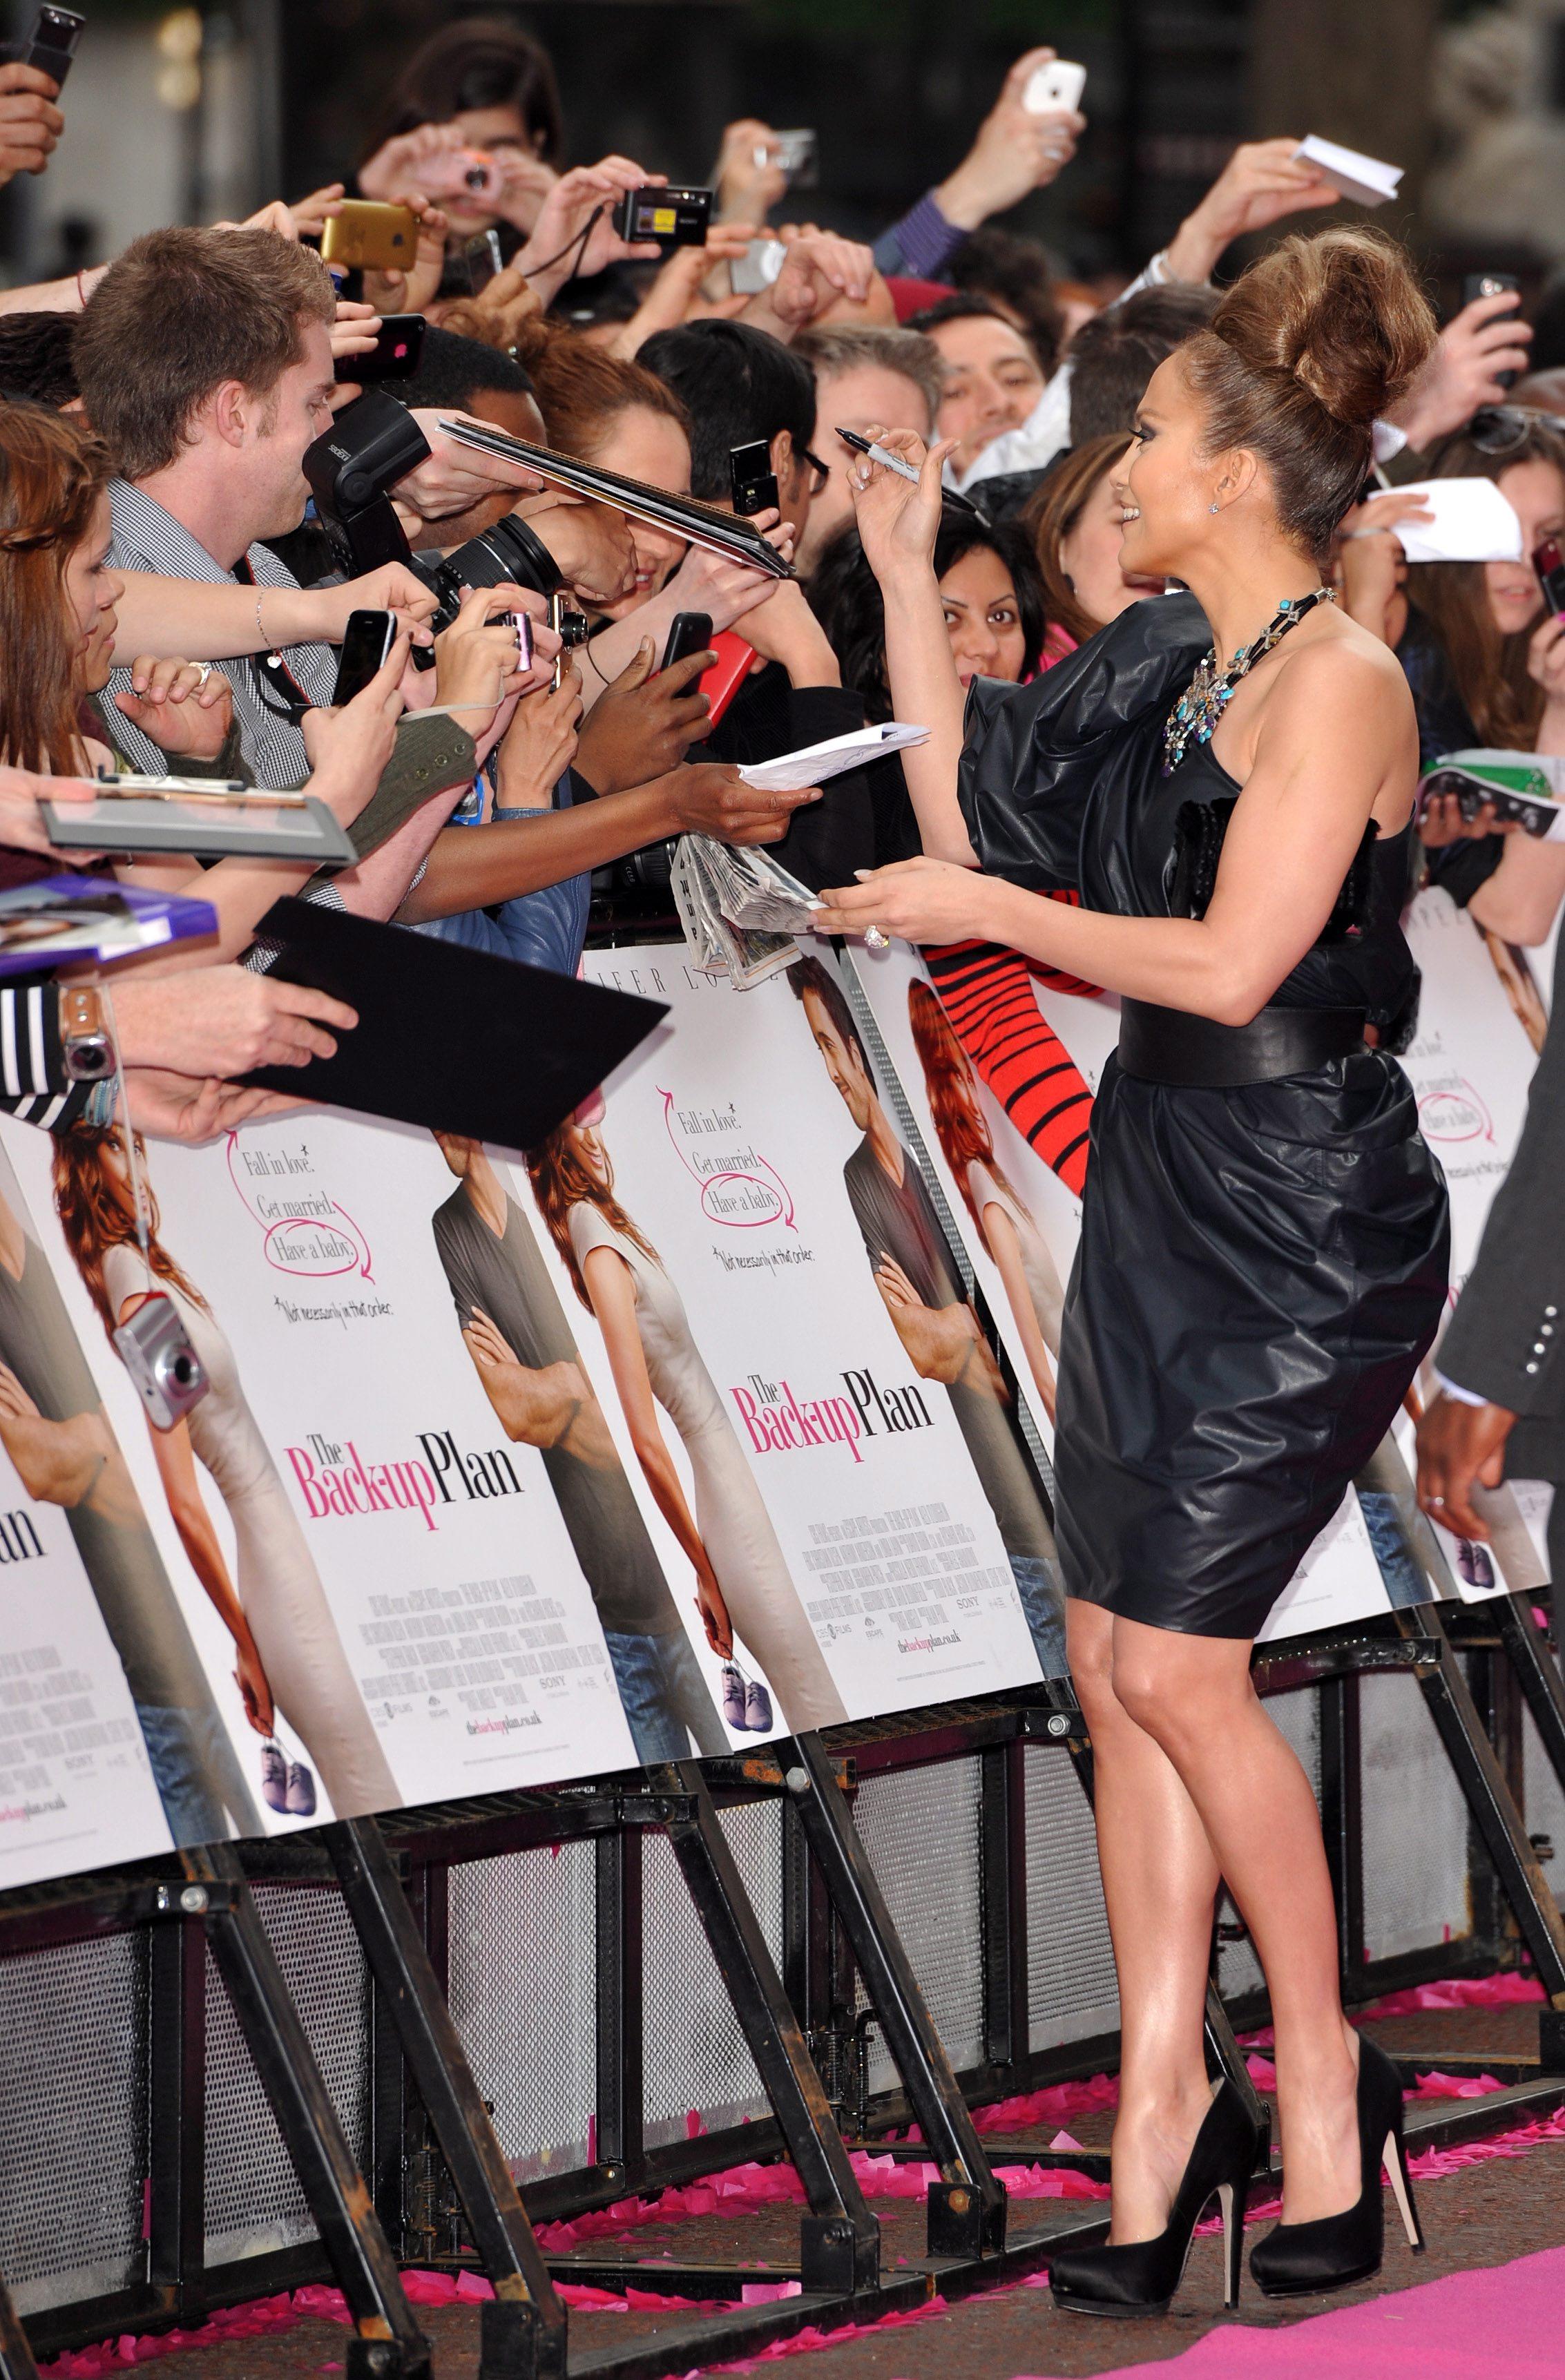 50010_celebrity_paradise.com_TheElder_JenniferLopez2010_04_28_TheBack_UpPlanUKPremiere132_122_128lo.jpg